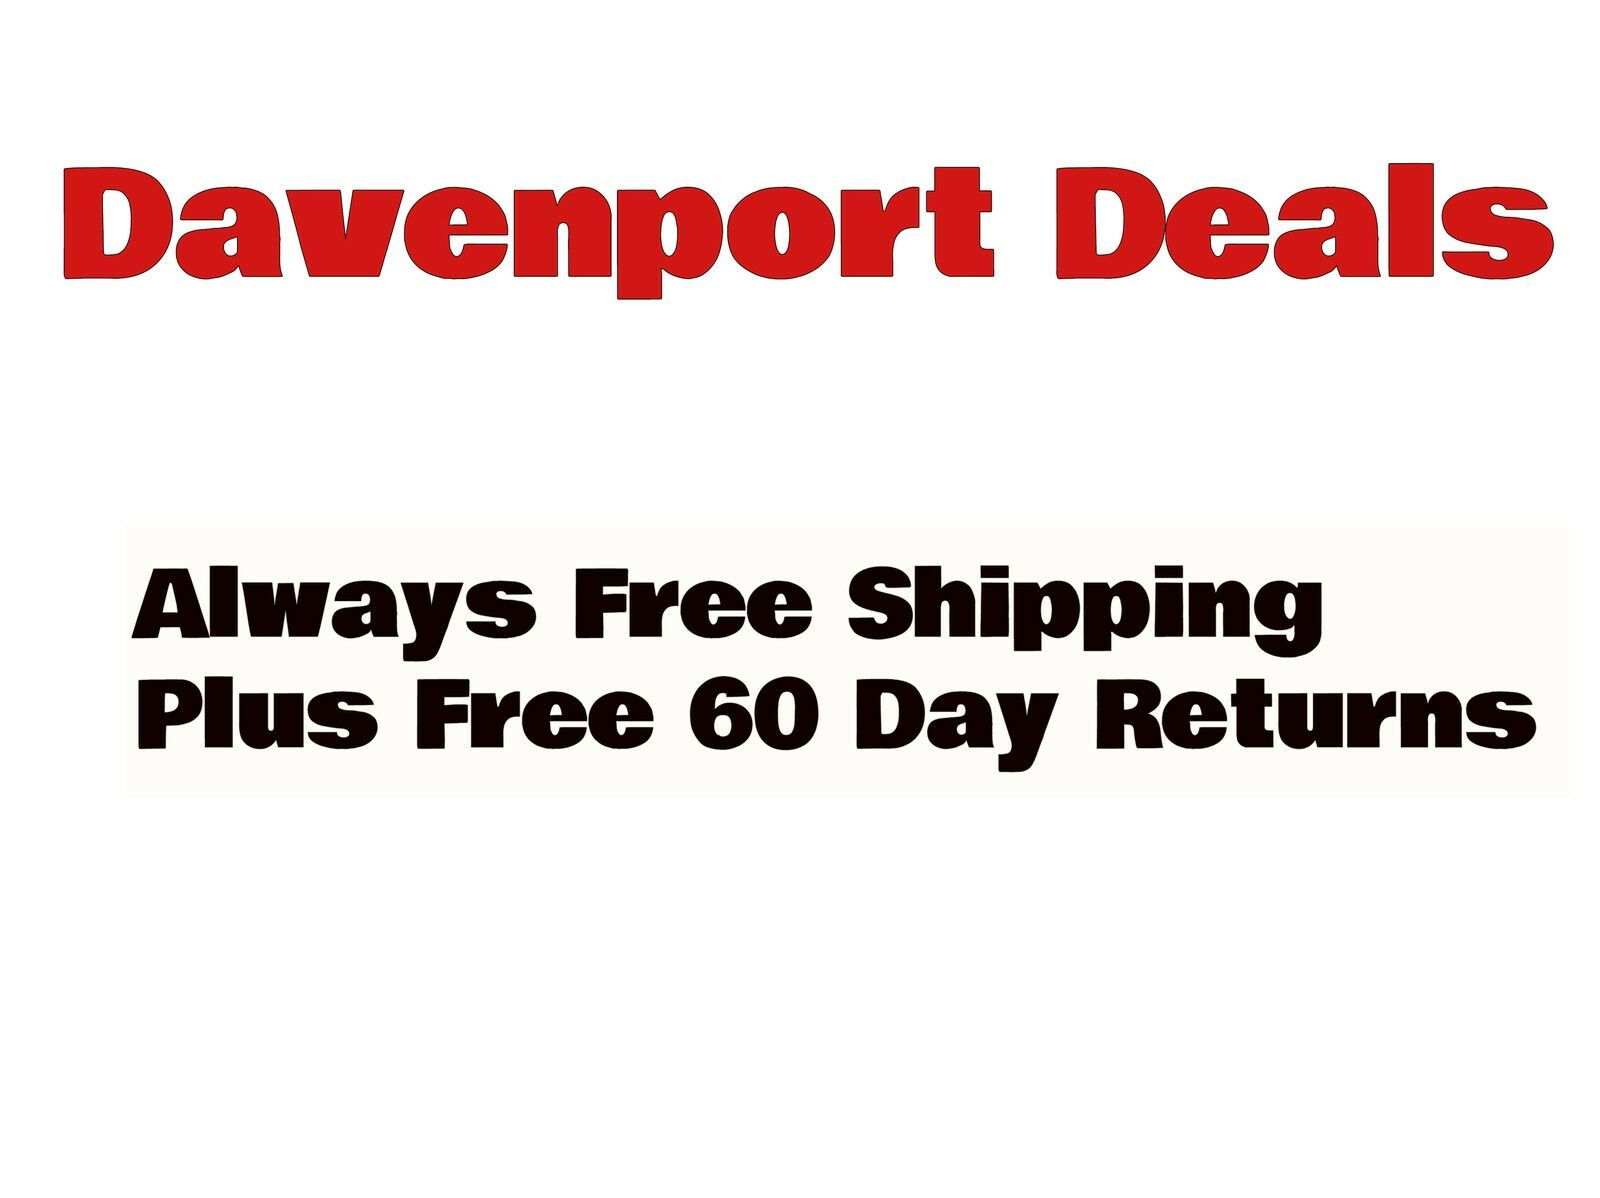 Davenport Deals Fast Free Shipping!